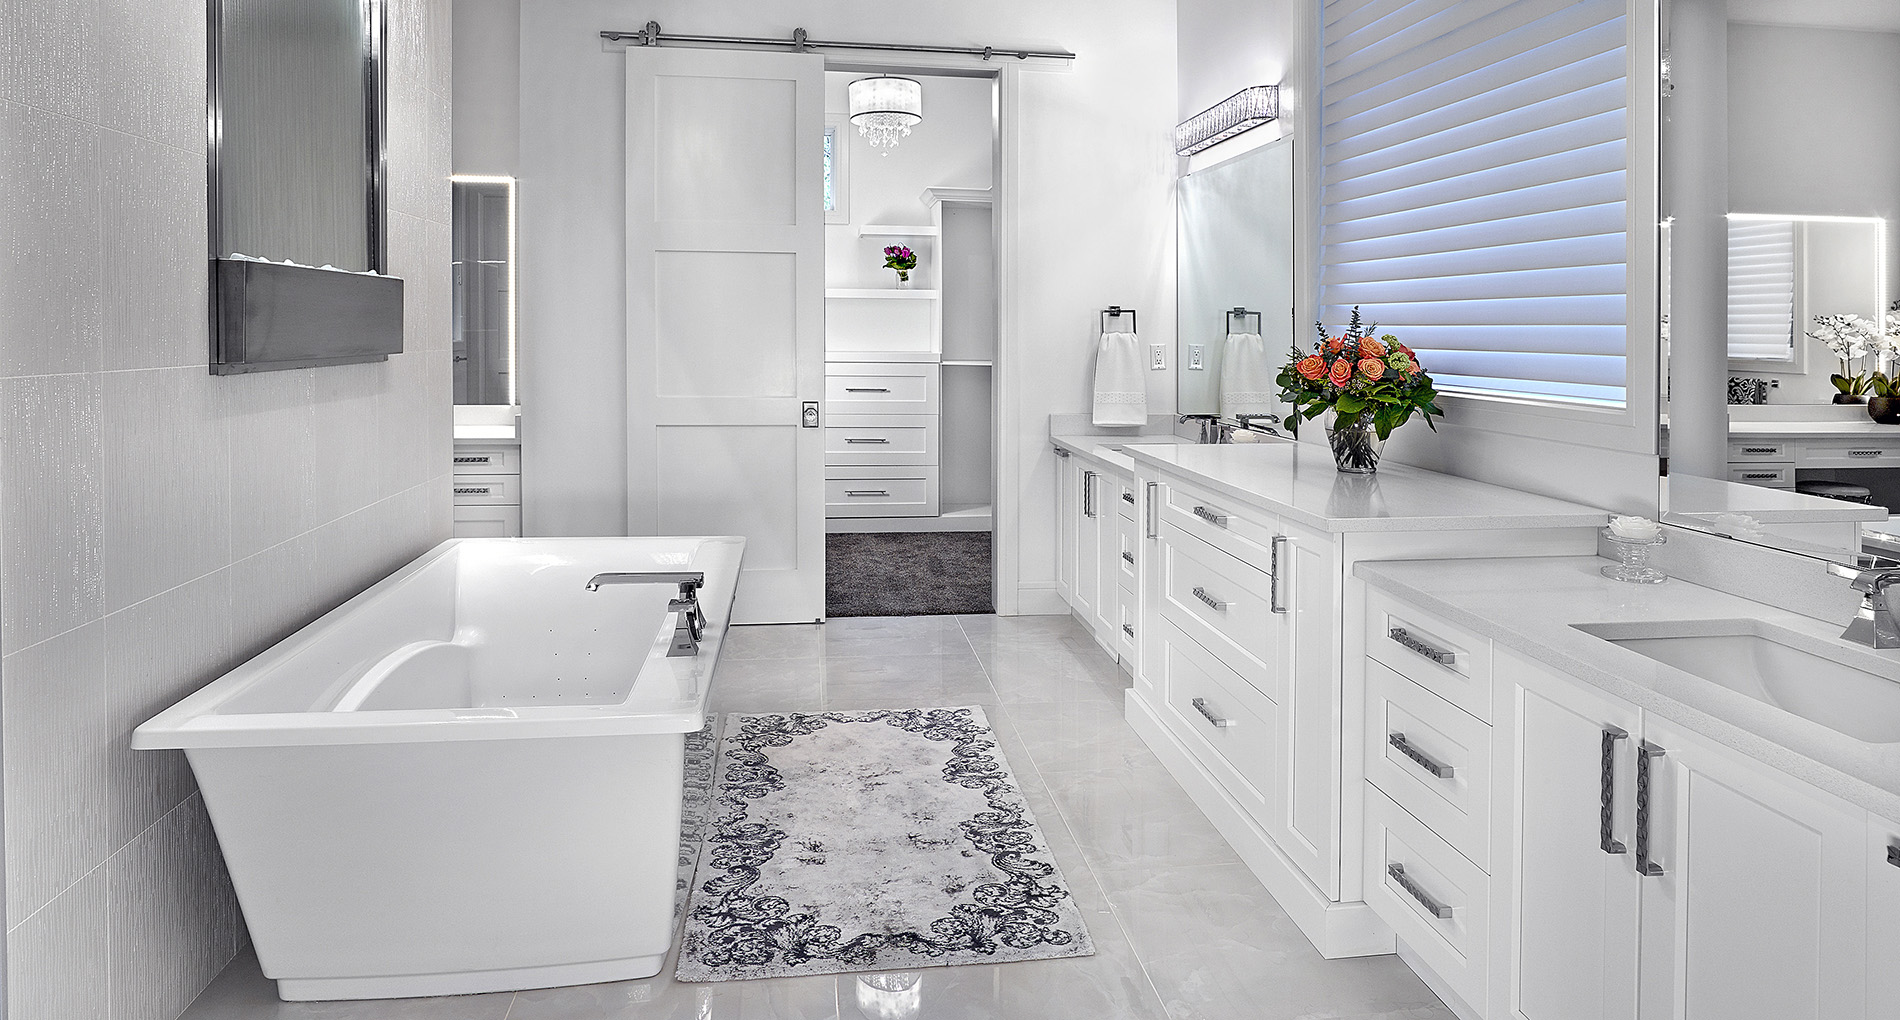 marble-bathroom-countertops